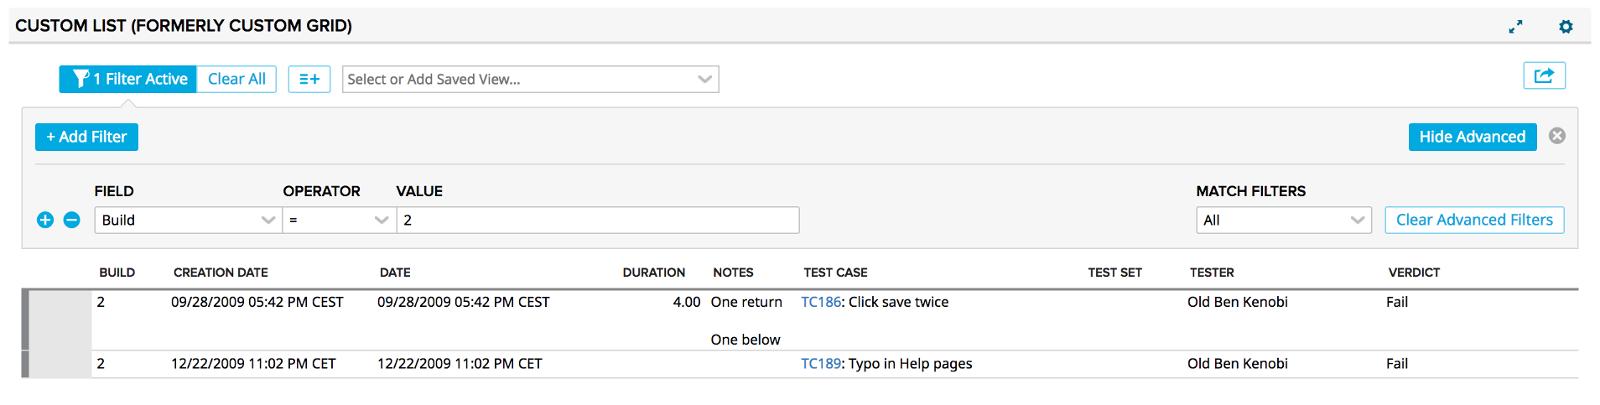 Custom List - Test Case Results